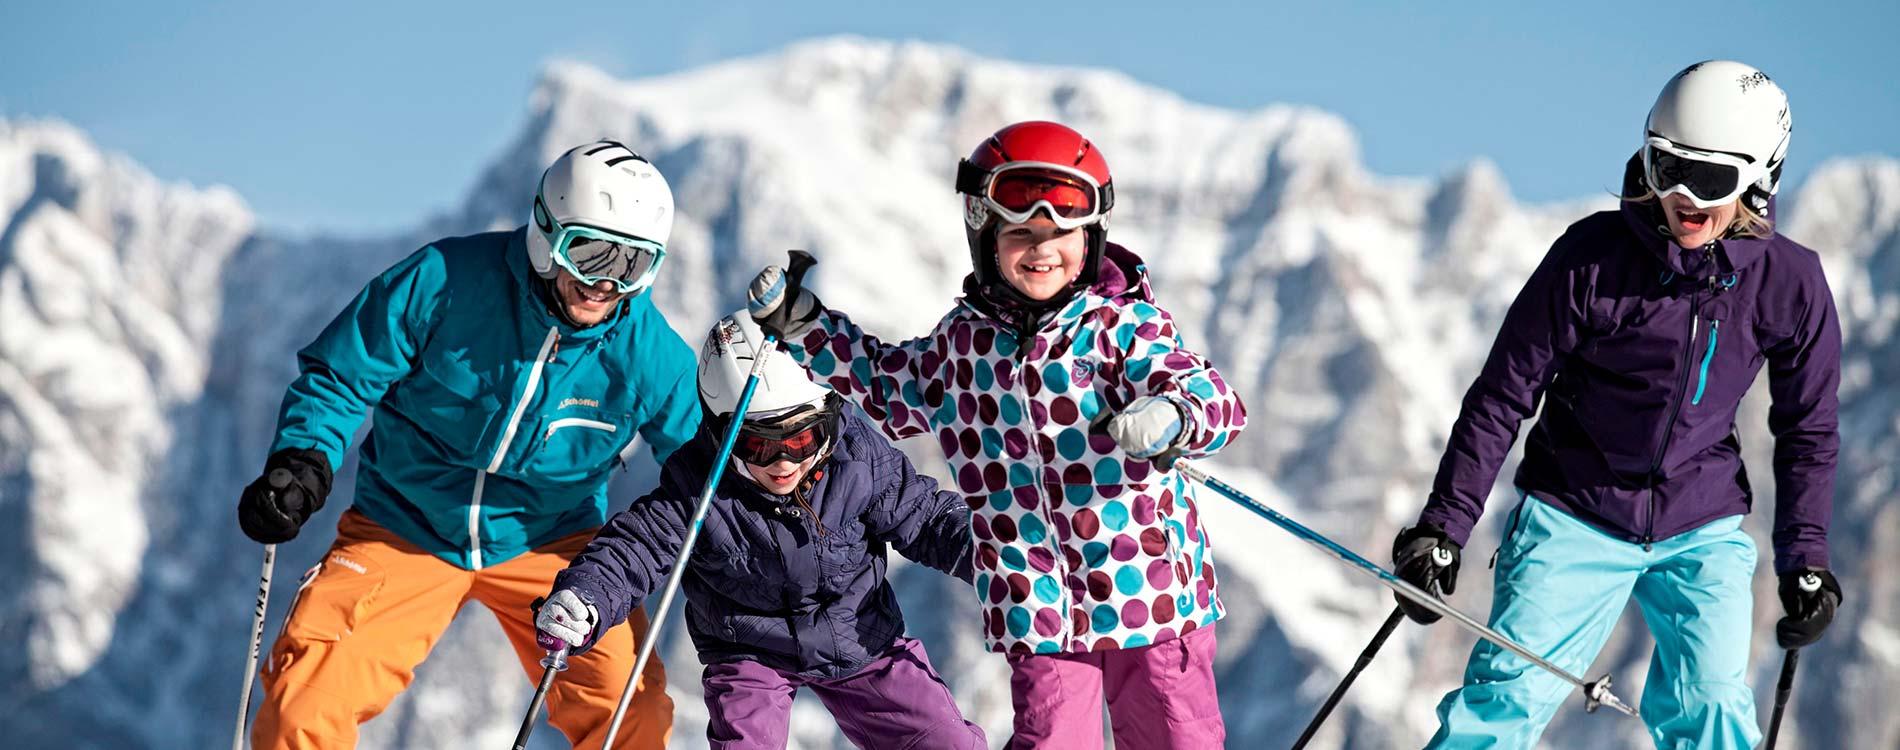 Family ski holiday in Ehrwald at the 4-star Tirolerhof Zugspitzarena Tirol Austria Family time